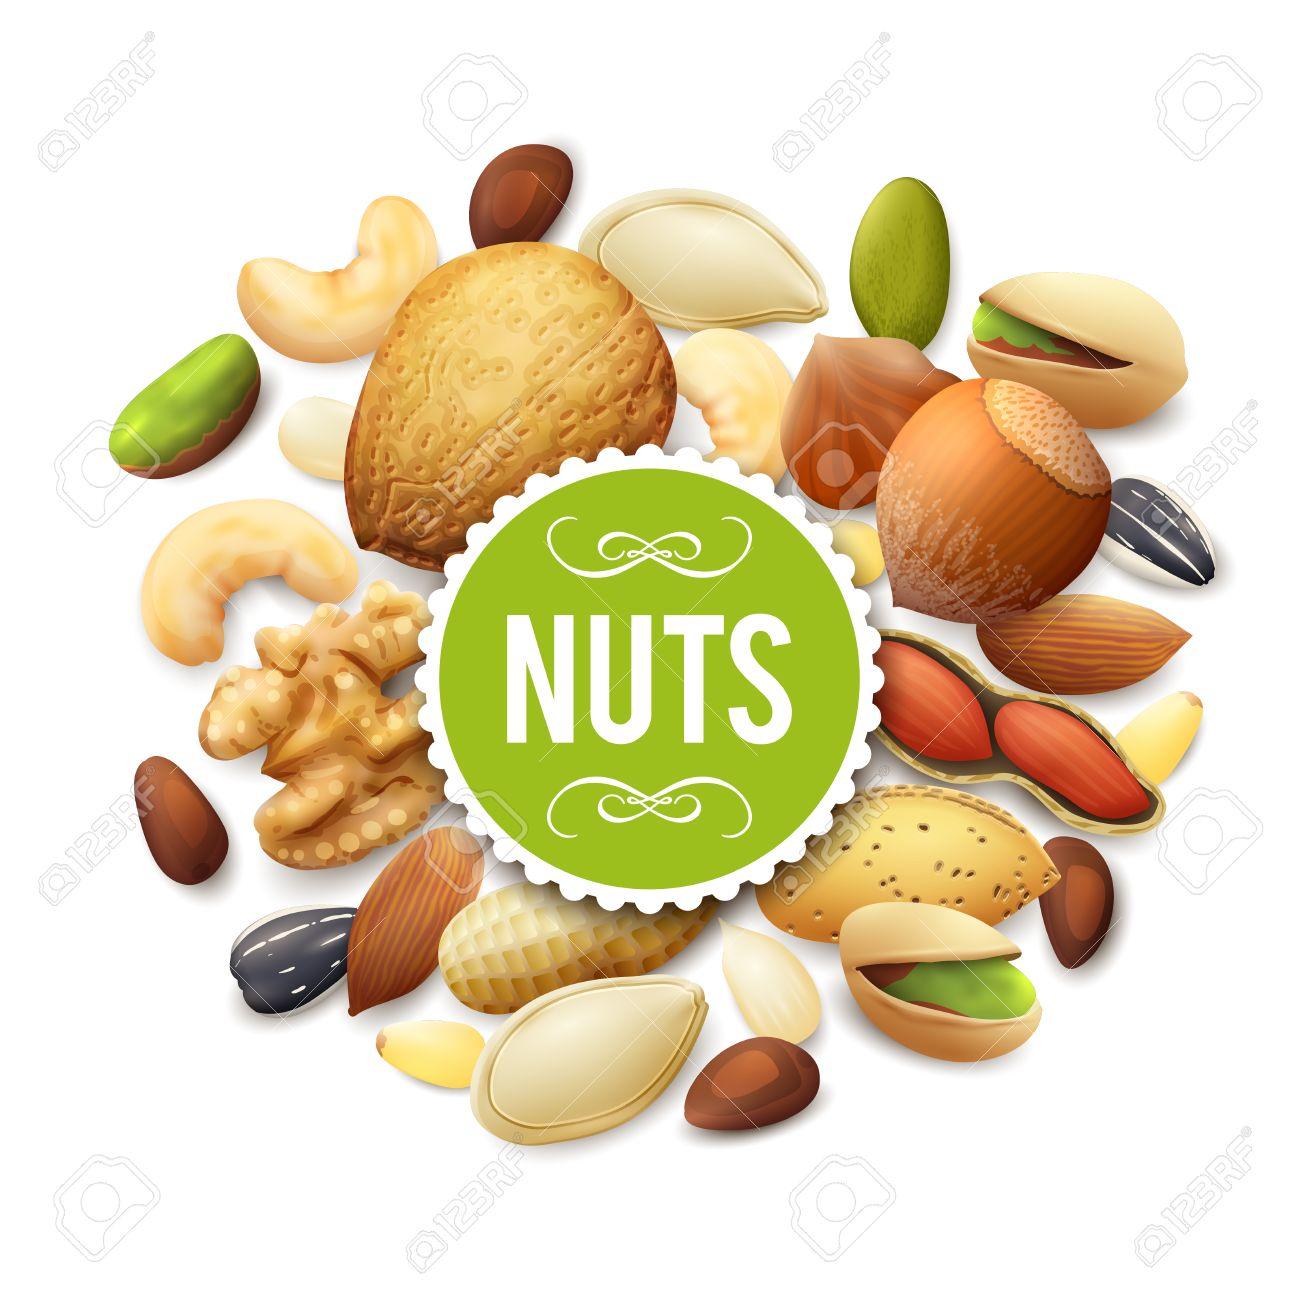 Mixed nuts clipart clip stock Nuts clipart mixed nut - 122 transparent clip arts, images ... clip stock